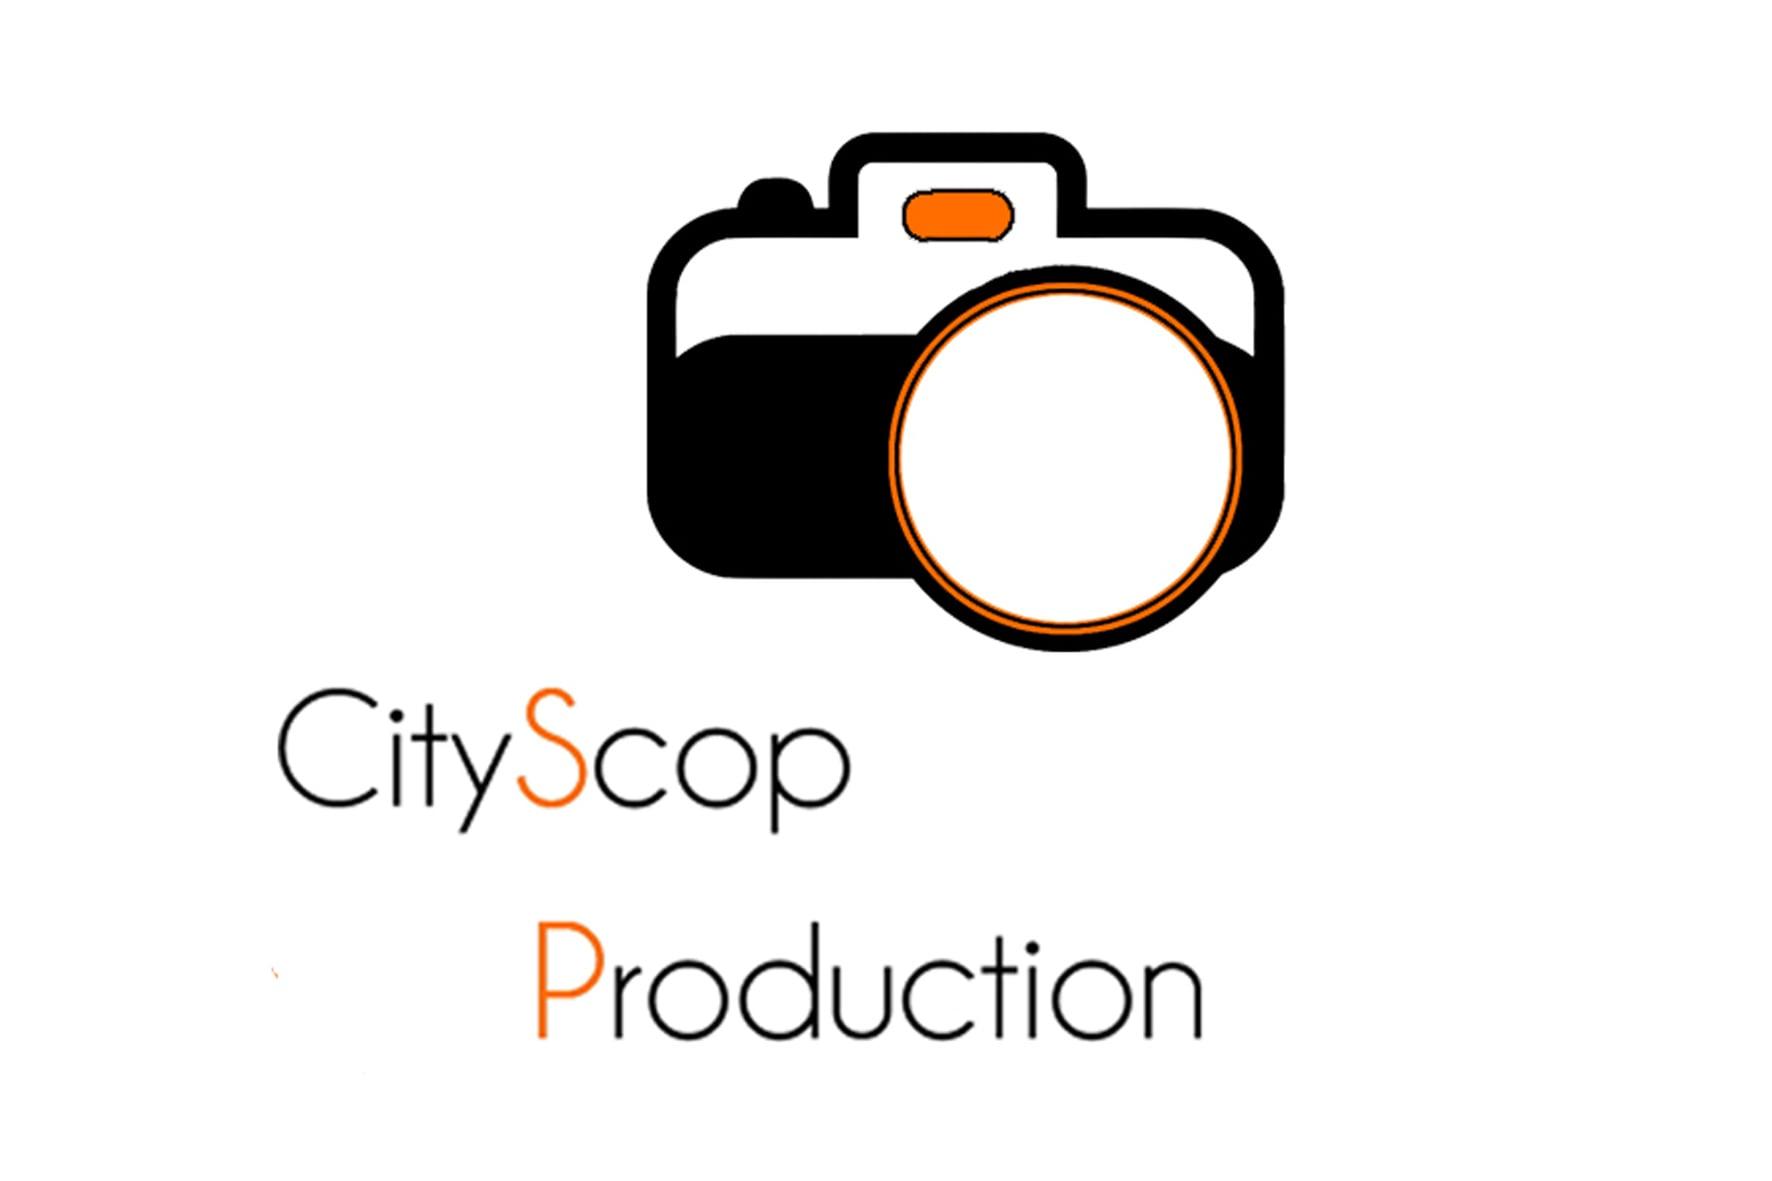 CityScop Production